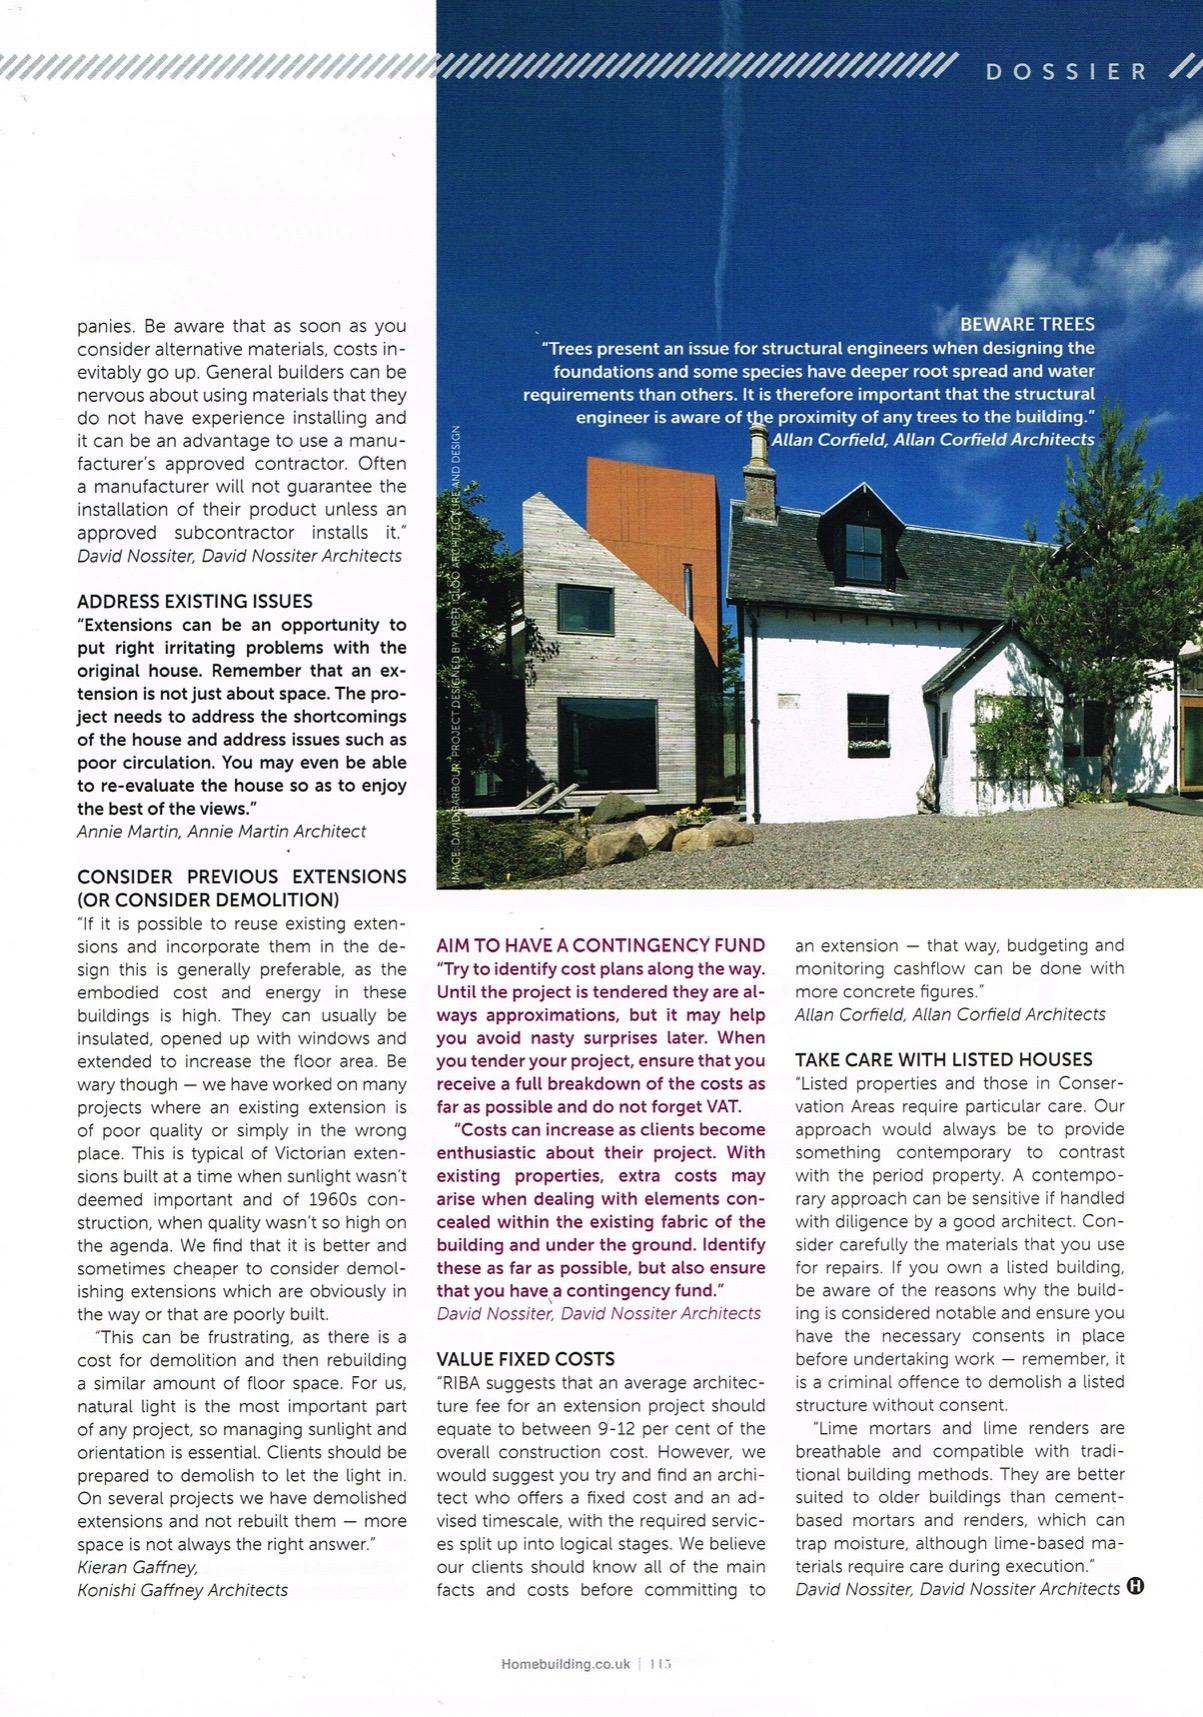 Homebuilding_Renovating_June_2016_Tips